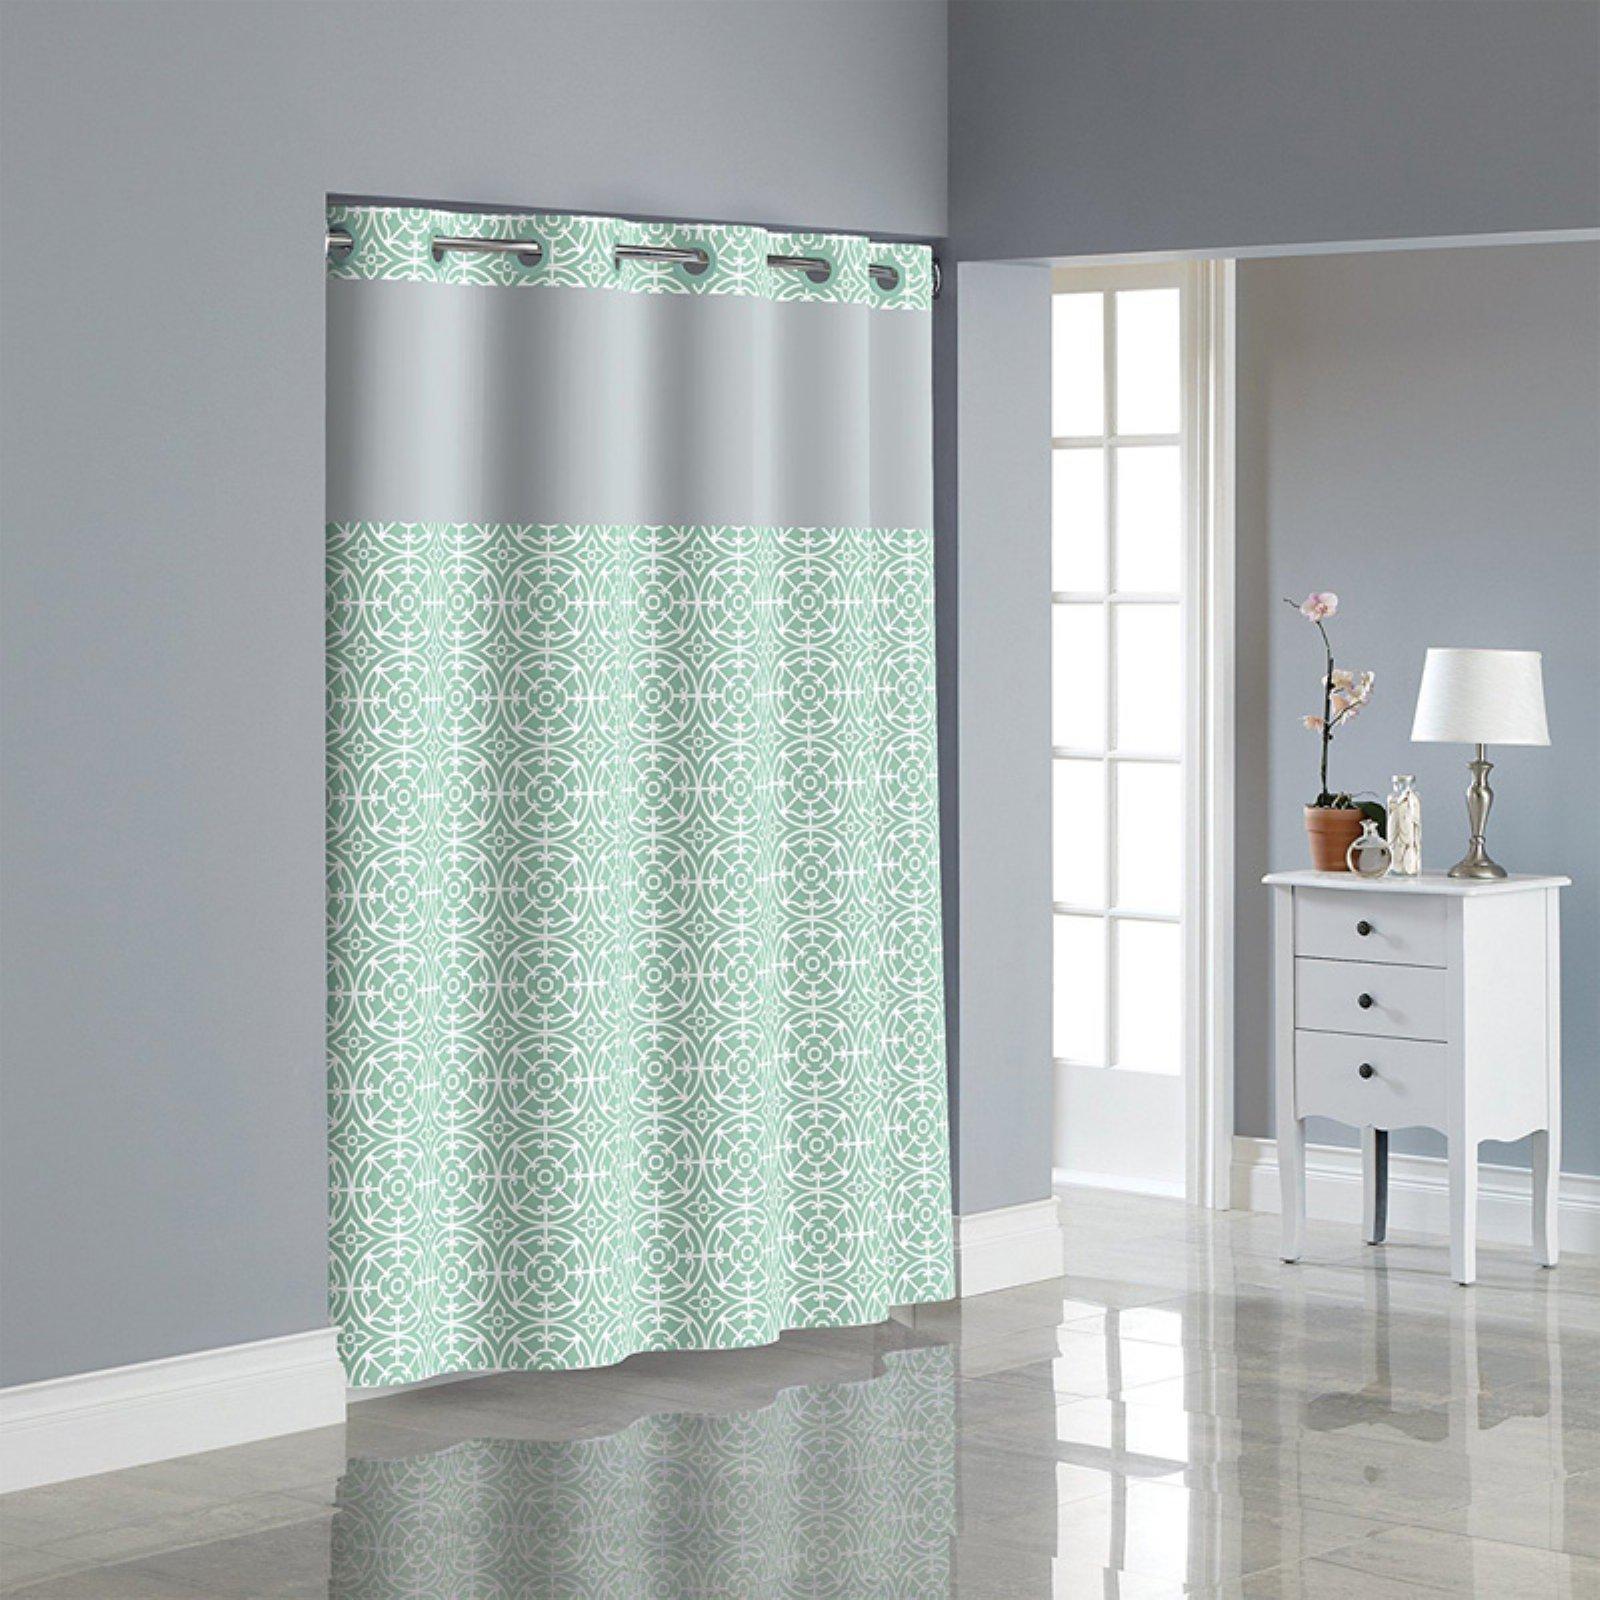 kohls shower curtains hookless | bath-supplies.store